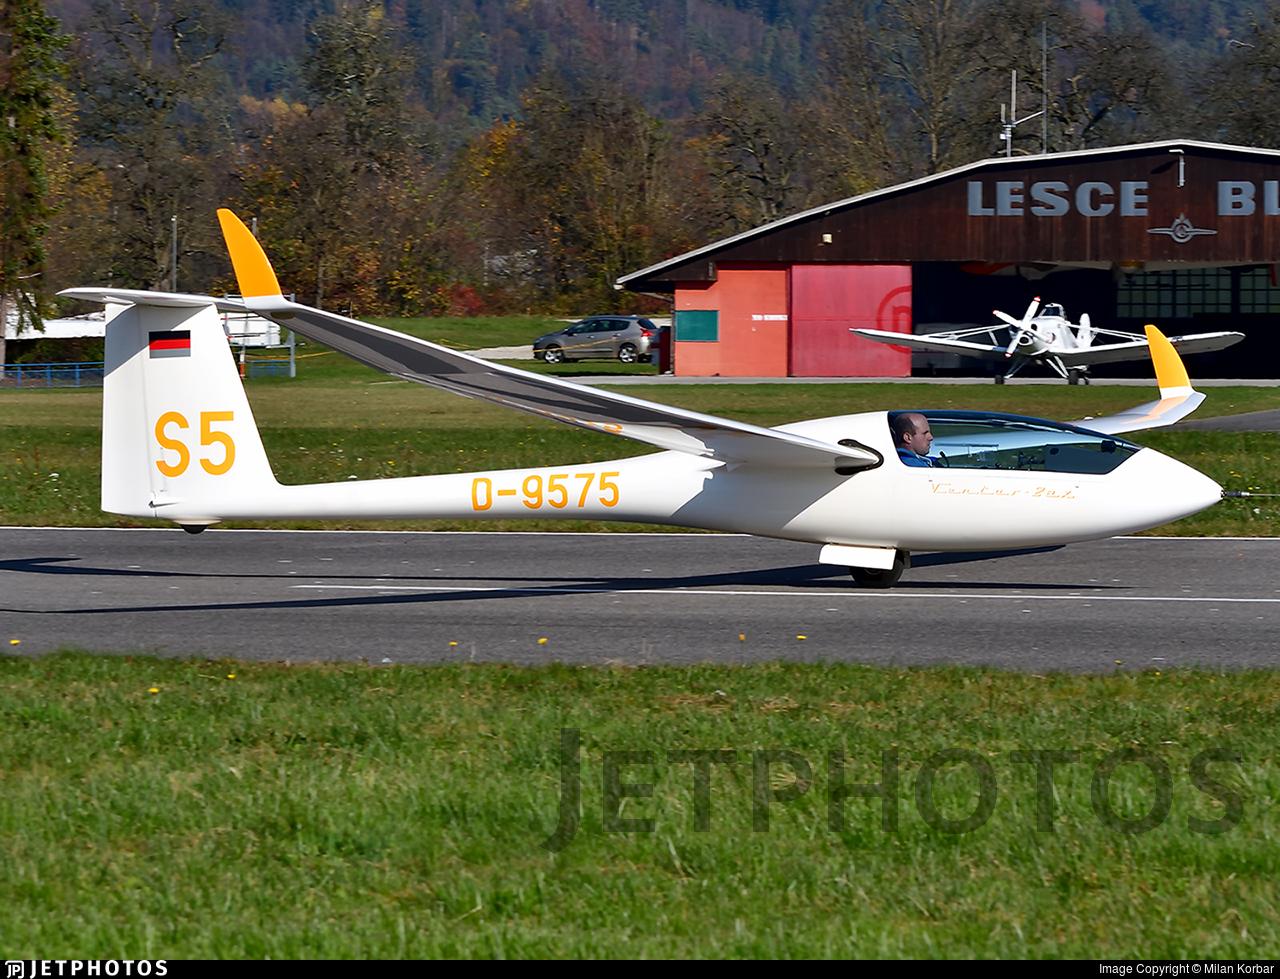 D-9575 - Schempp Hirth Ventus 2aX - Private